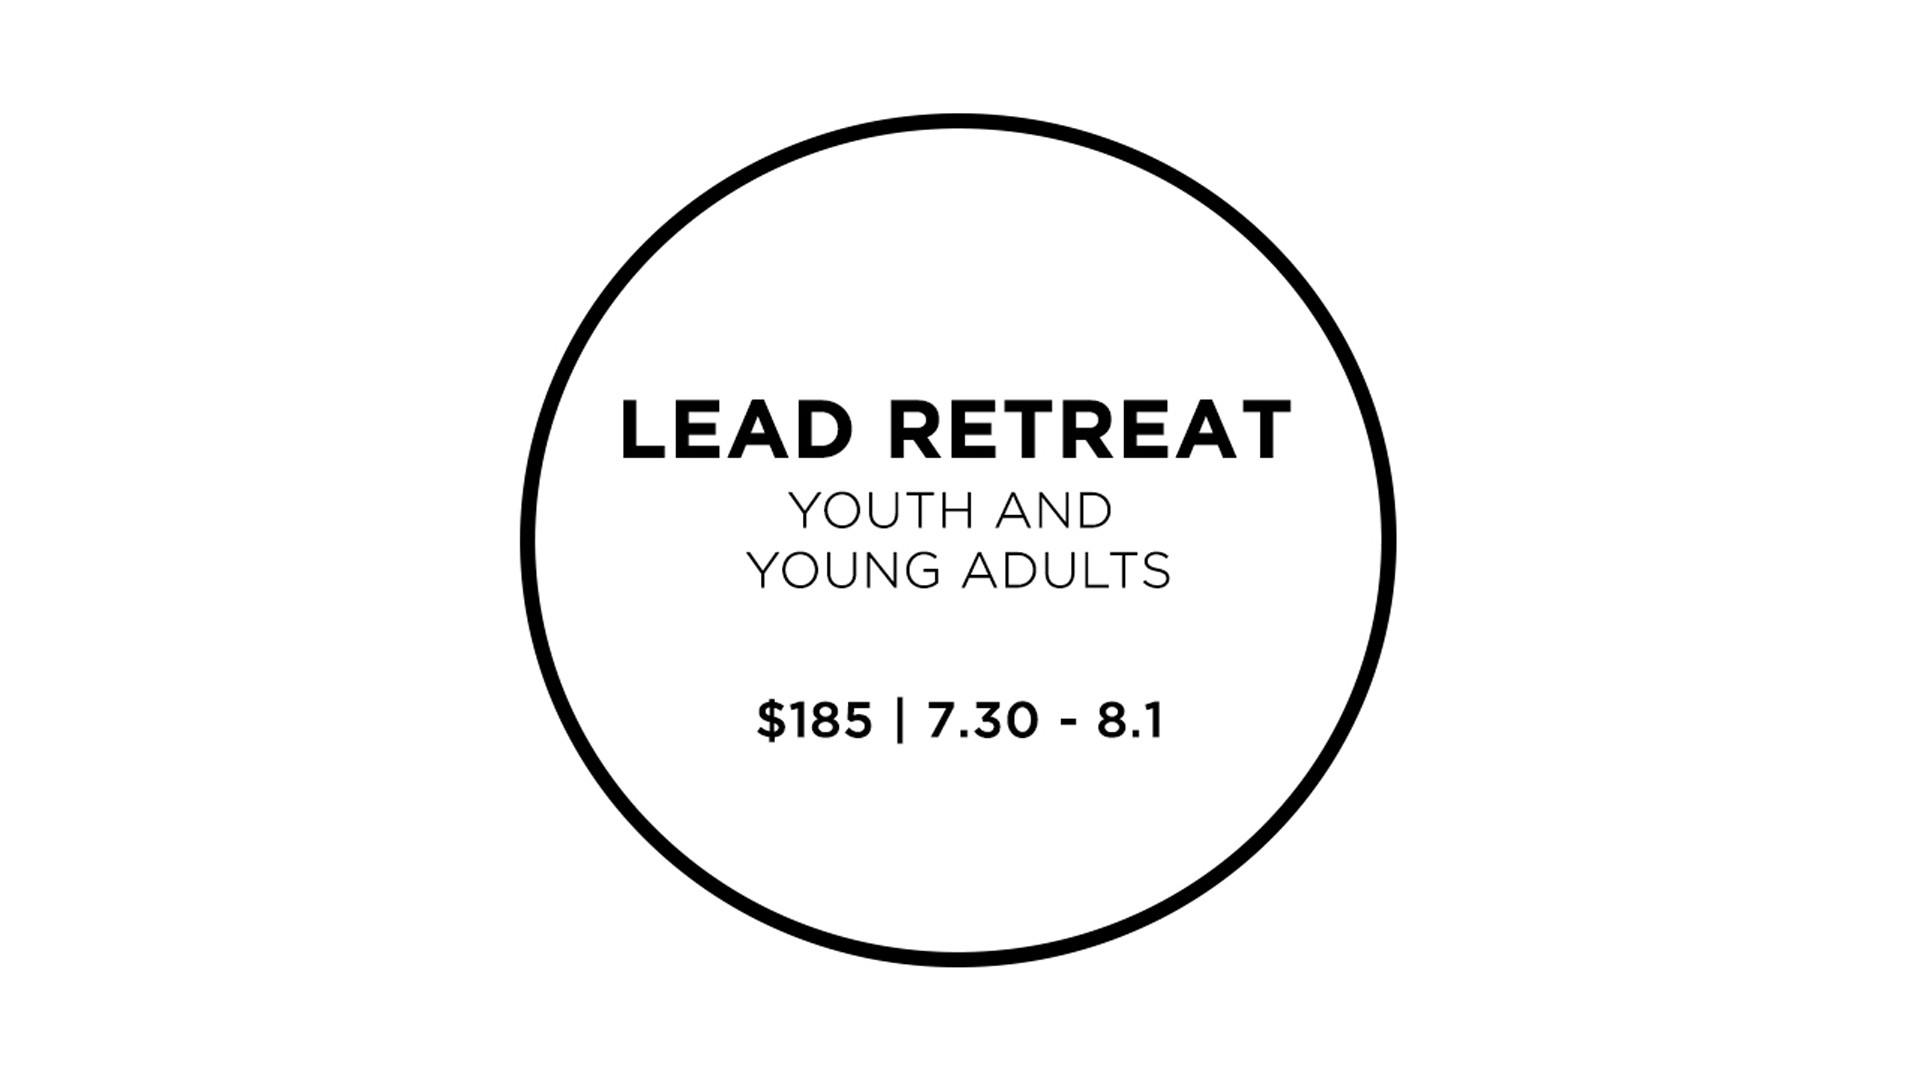 Leadretreat